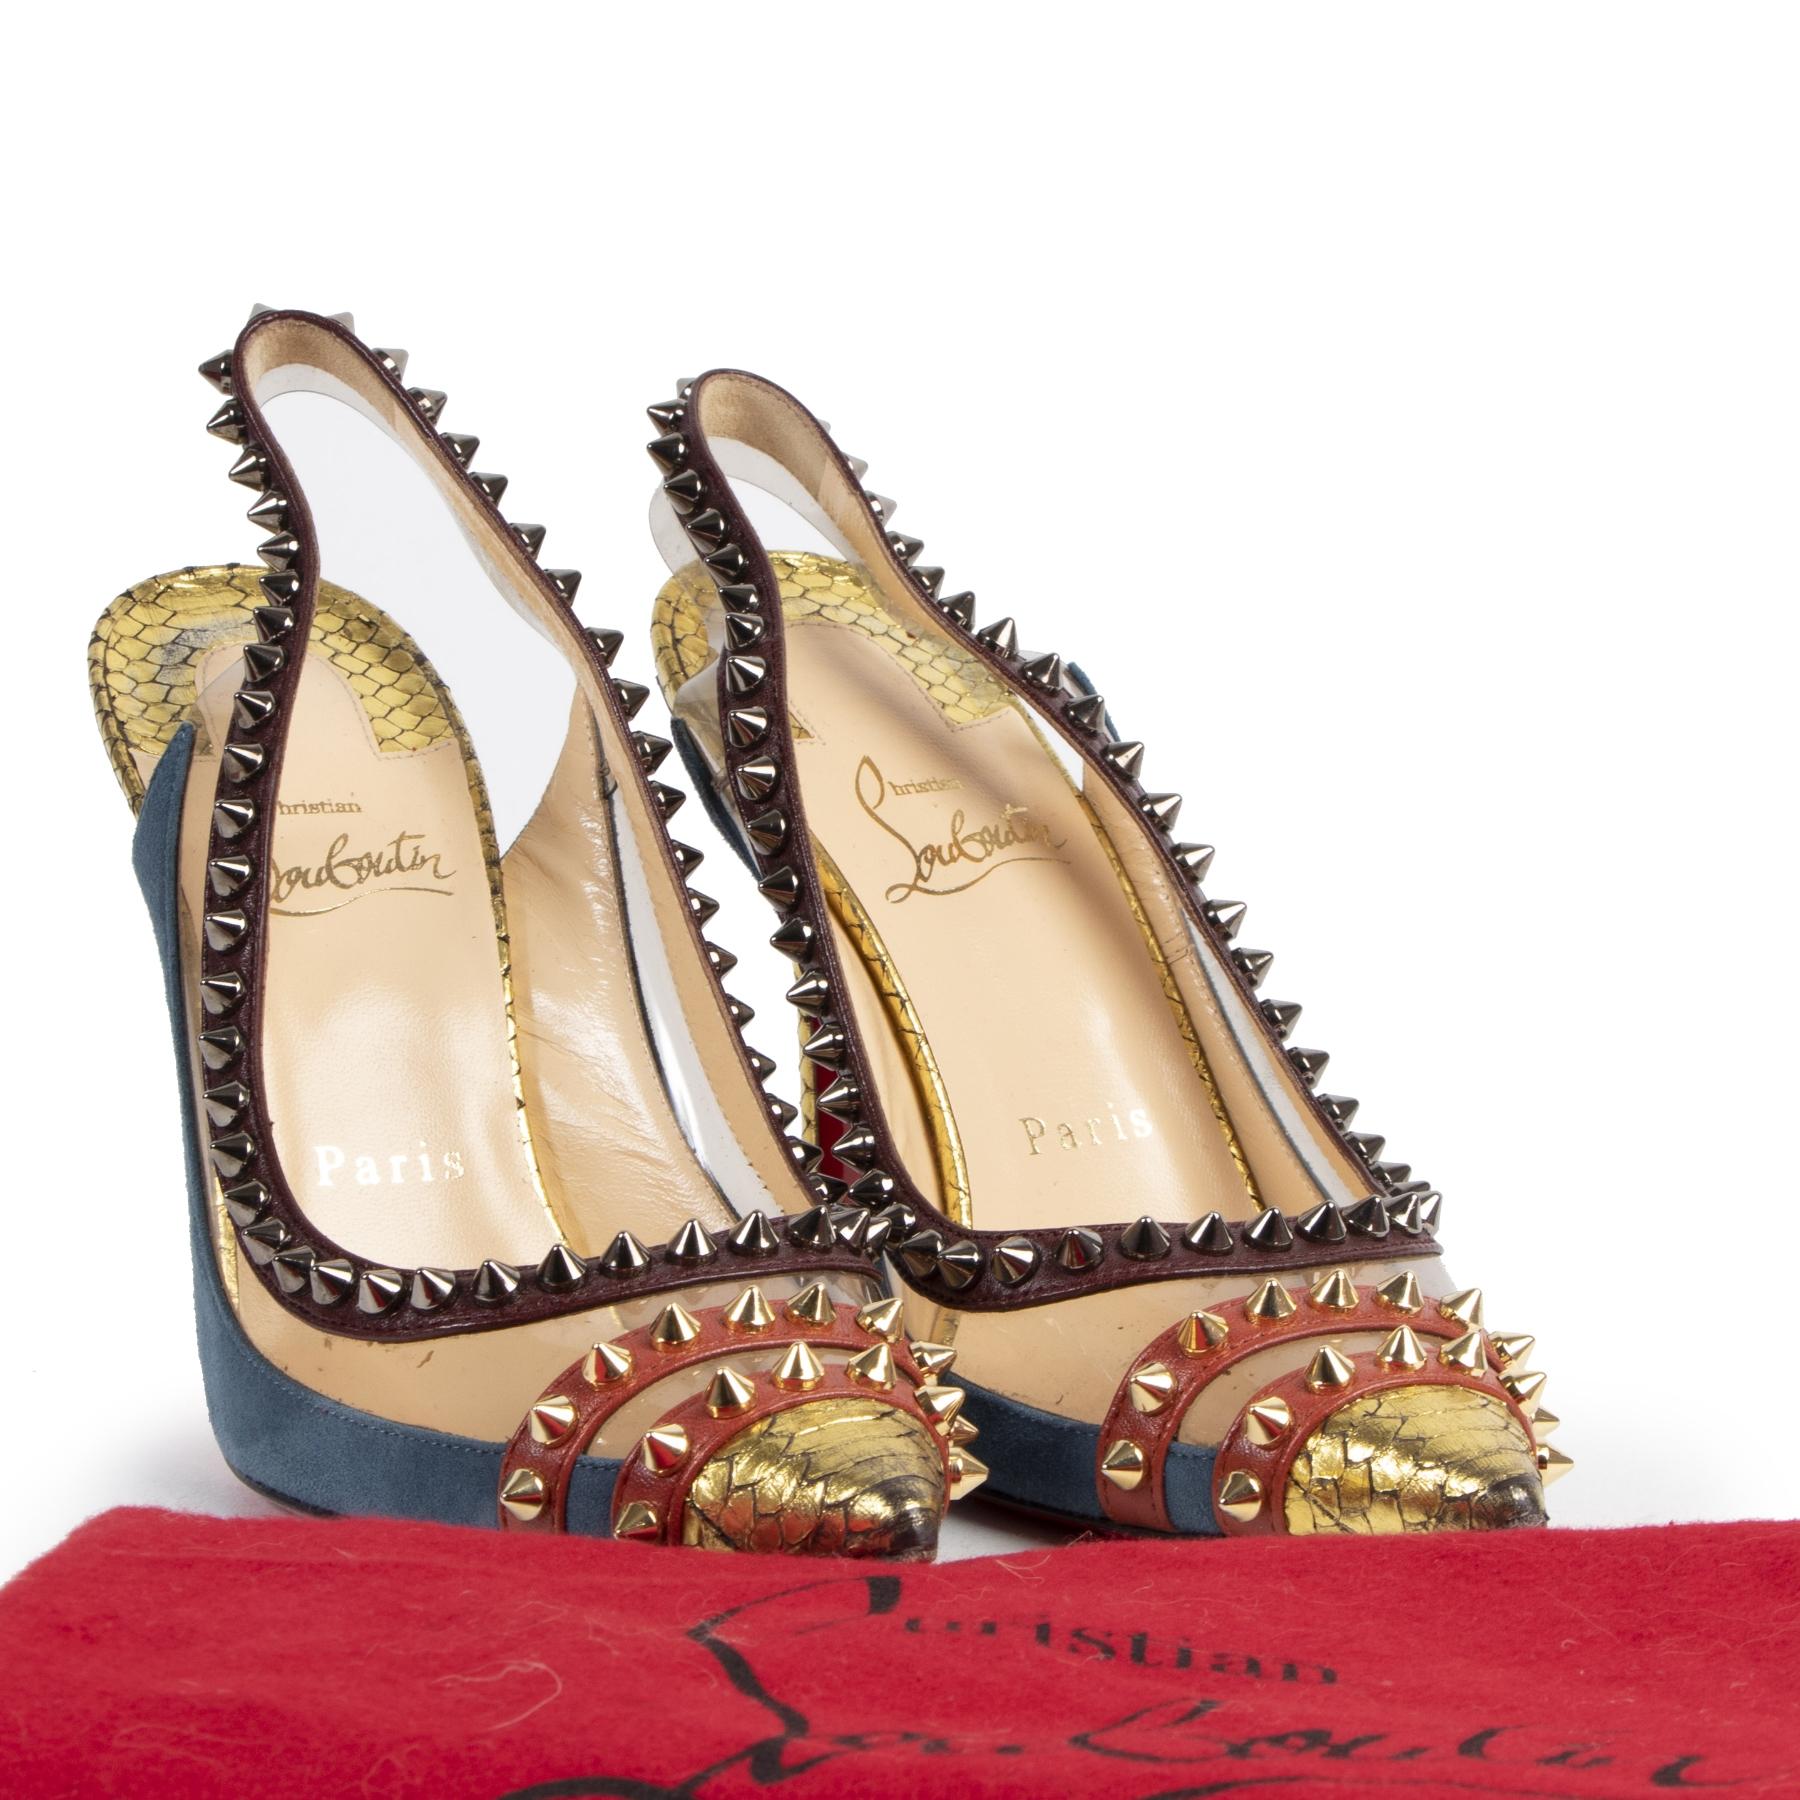 Authentic secondhand Christian Louboutin Multicolor Studded Heels - Size 36 designer bags fashion luxury vintage webshop safe secure online shopping high end designer brands